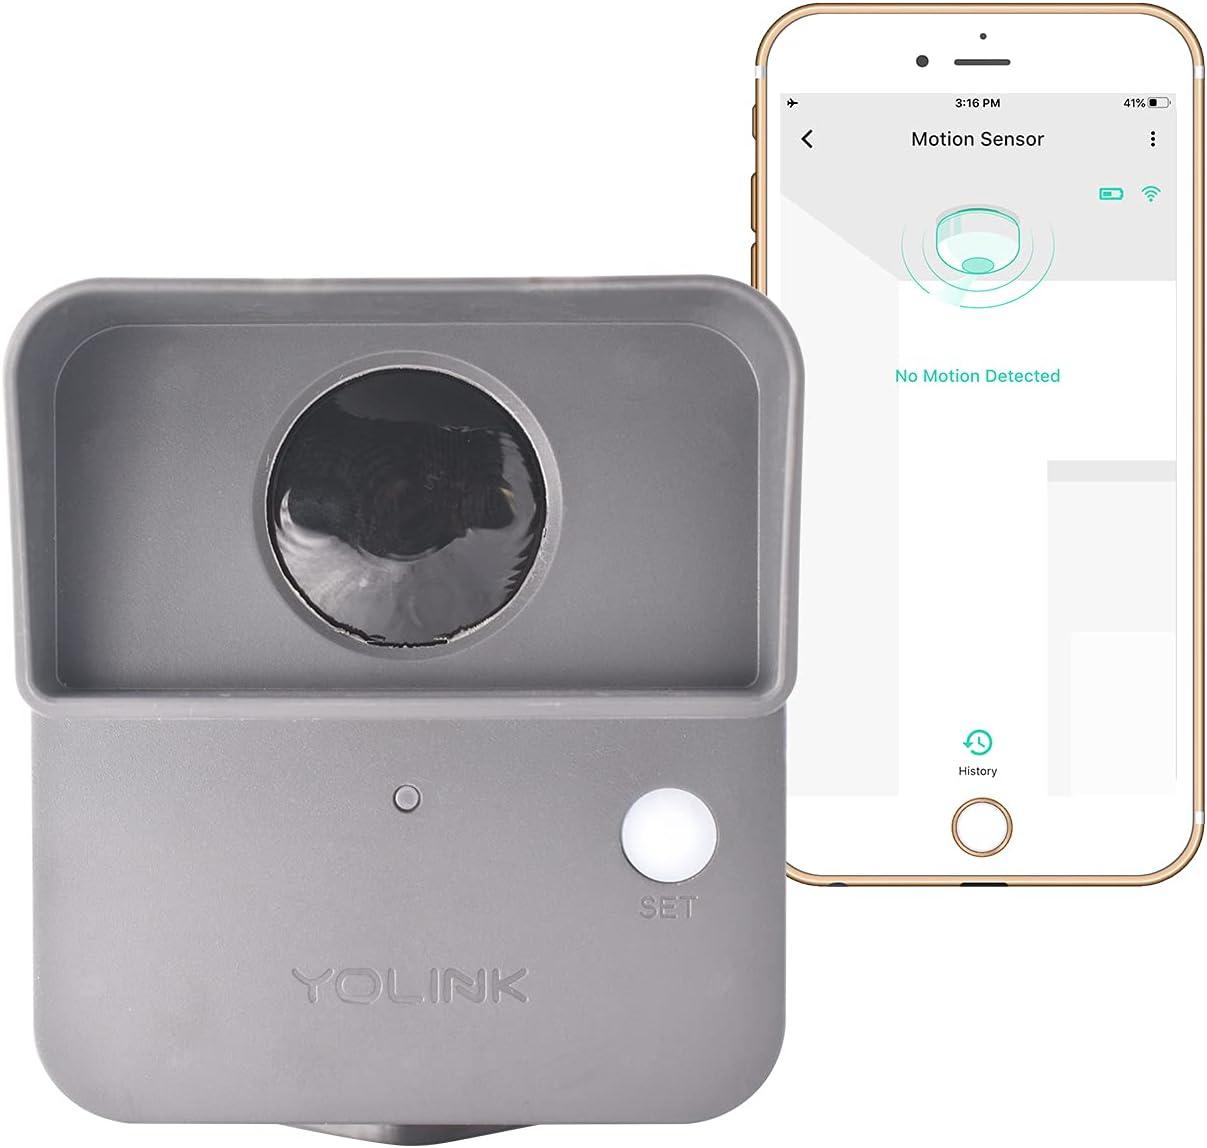 YoLink Smart Outdoor Motion Detector, Trespassing Alarm, Driveway Alert, 1/4 Mile Range LoRa-Powered Wireless Motion Sensor, App for Remote Monitoring & Alerts, Alexa, IFTTT. Hub Required!